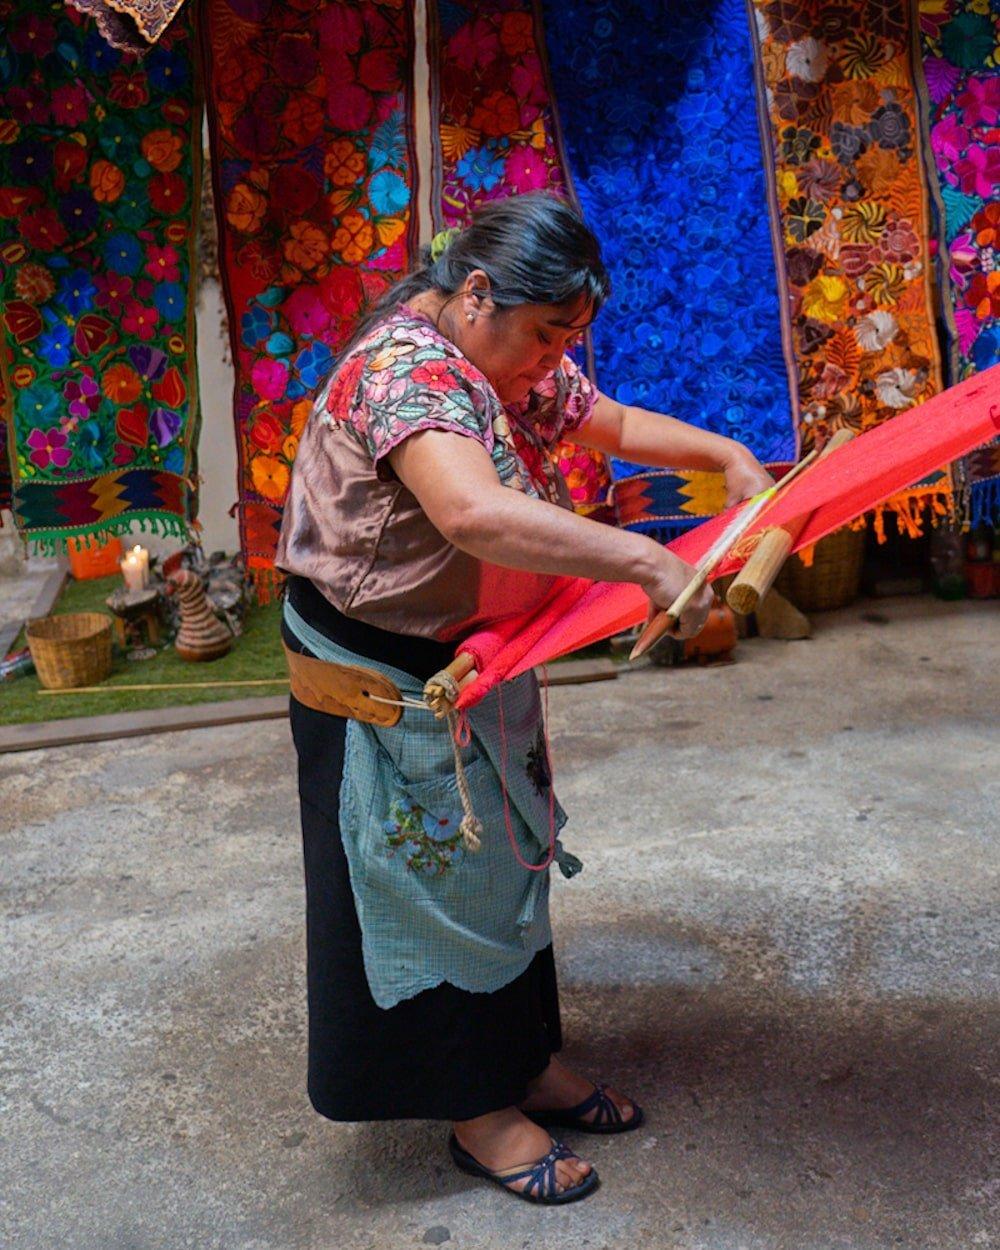 Tzotzil maya woman weaving with backstrap loom